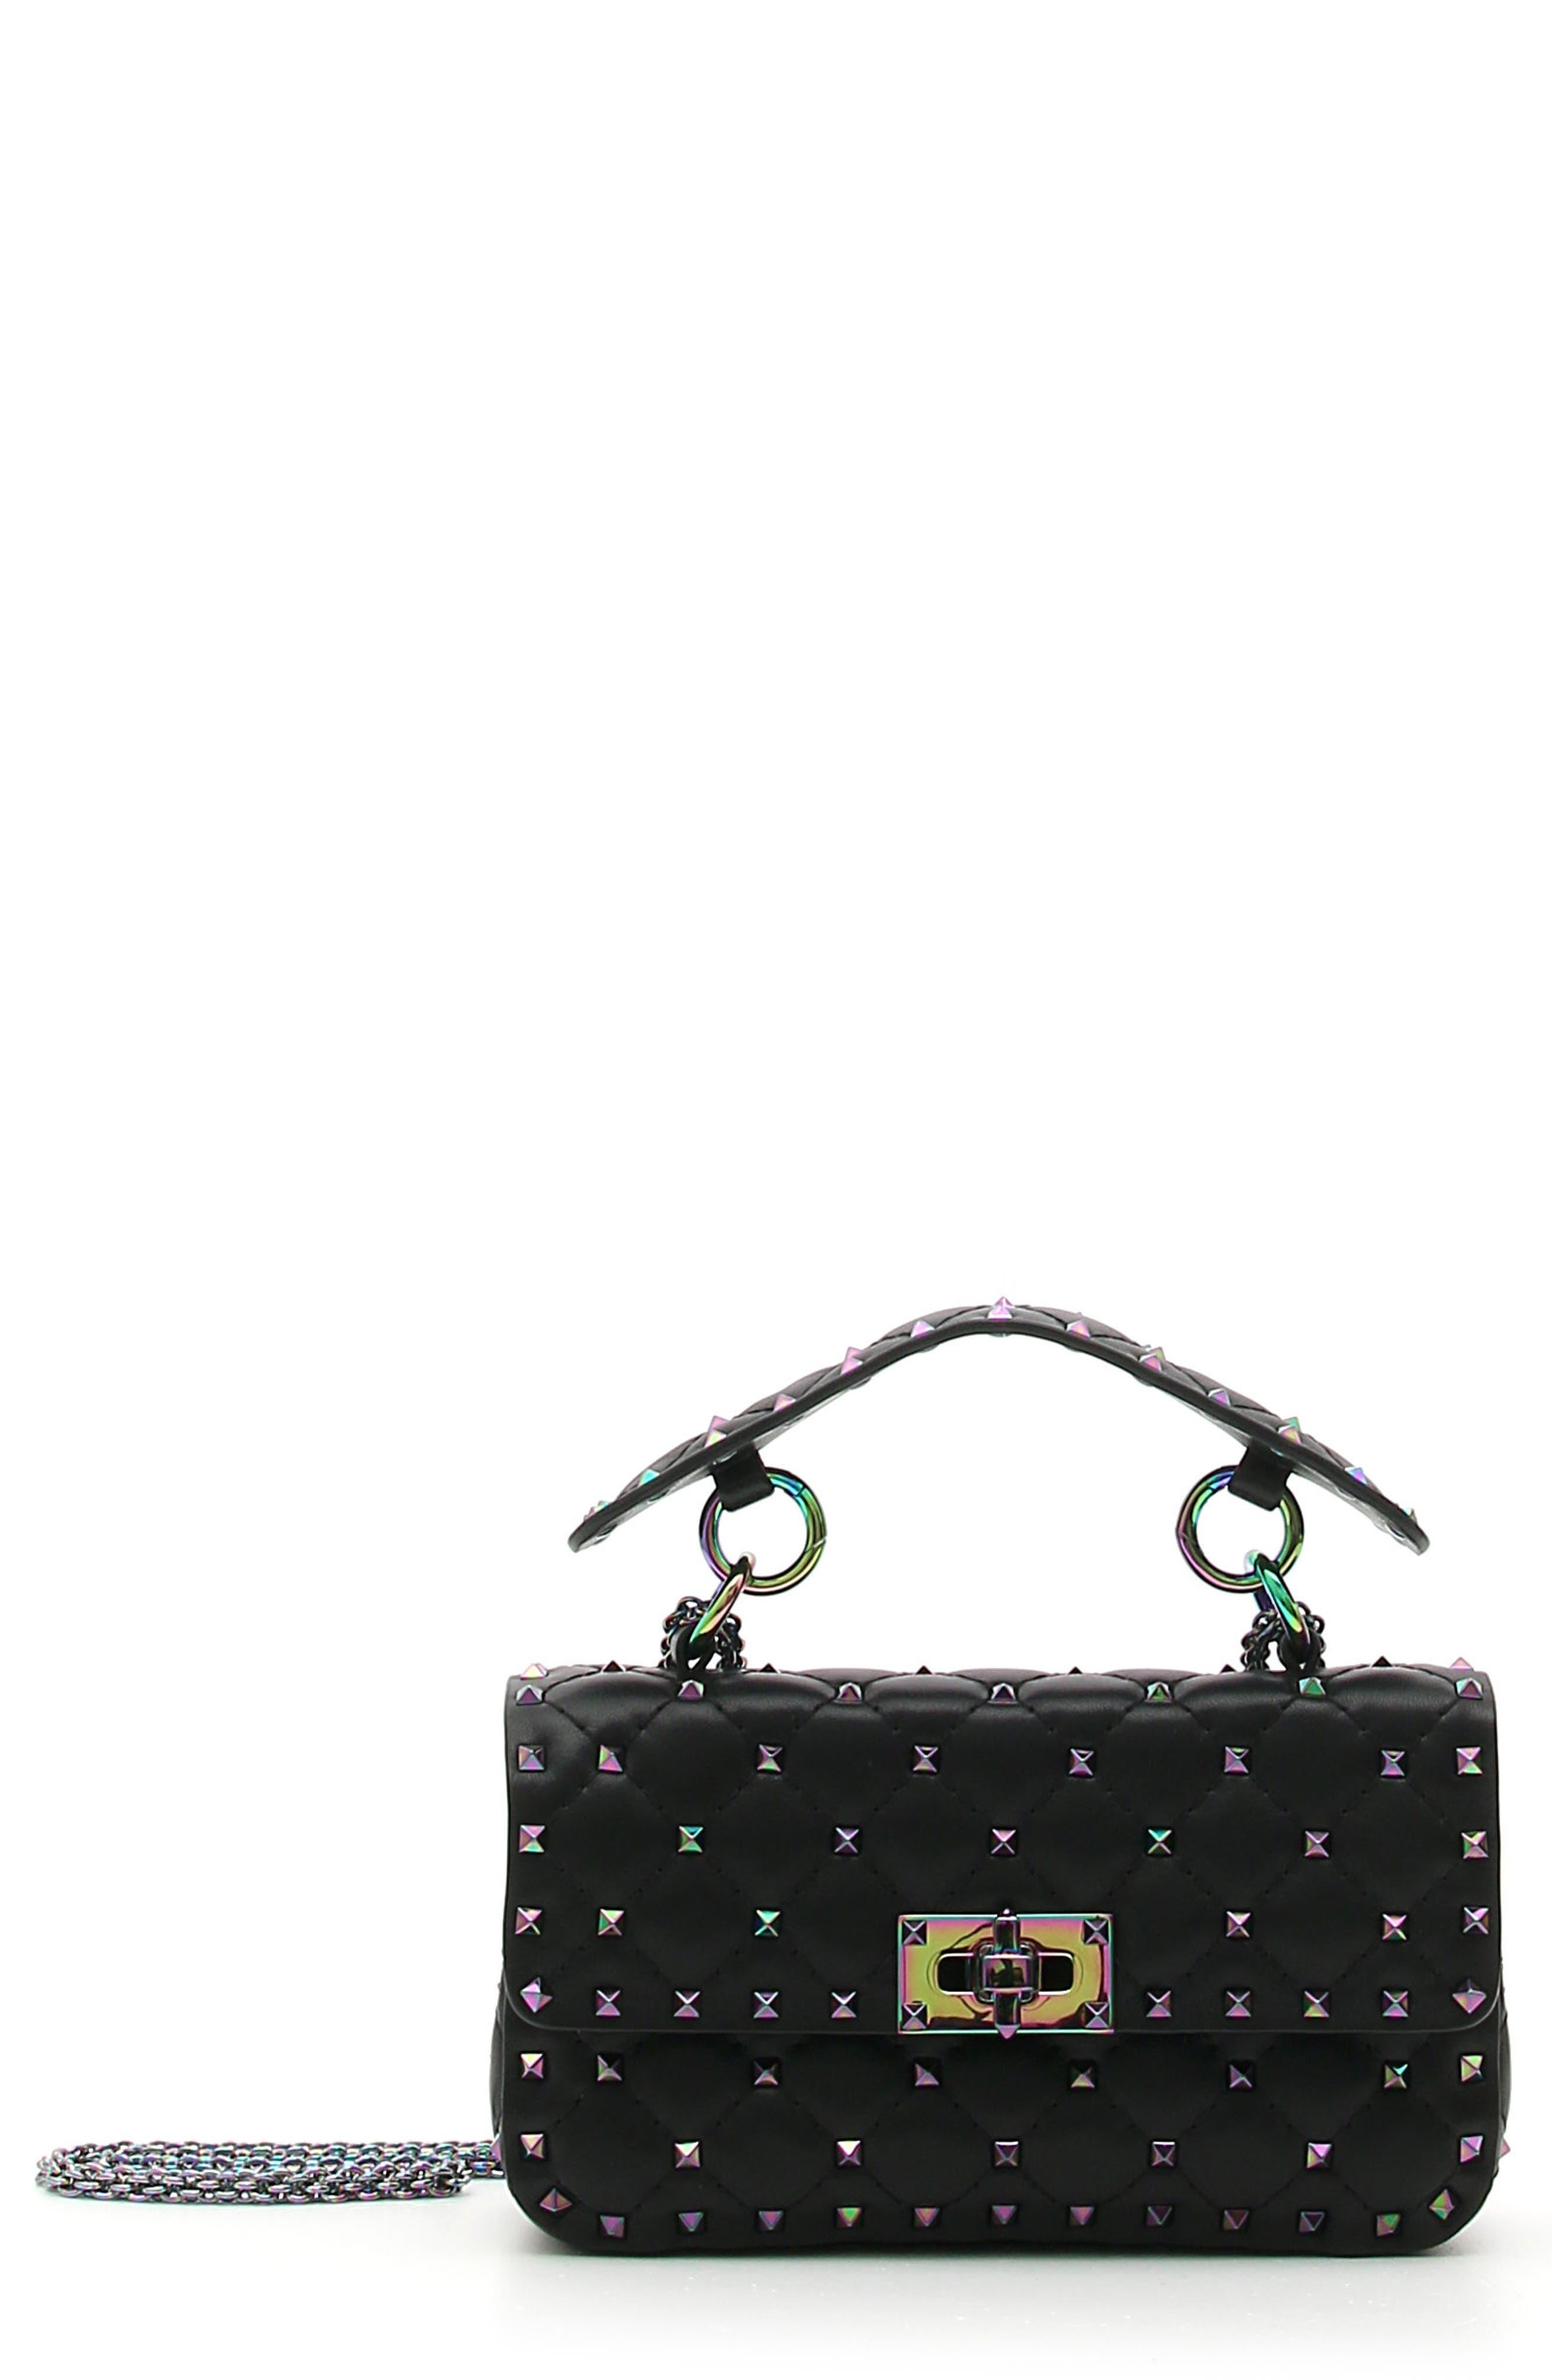 Small Oil Slick Rockstud Spike Lambskin Shoulder Bag,                             Main thumbnail 1, color,                             Black